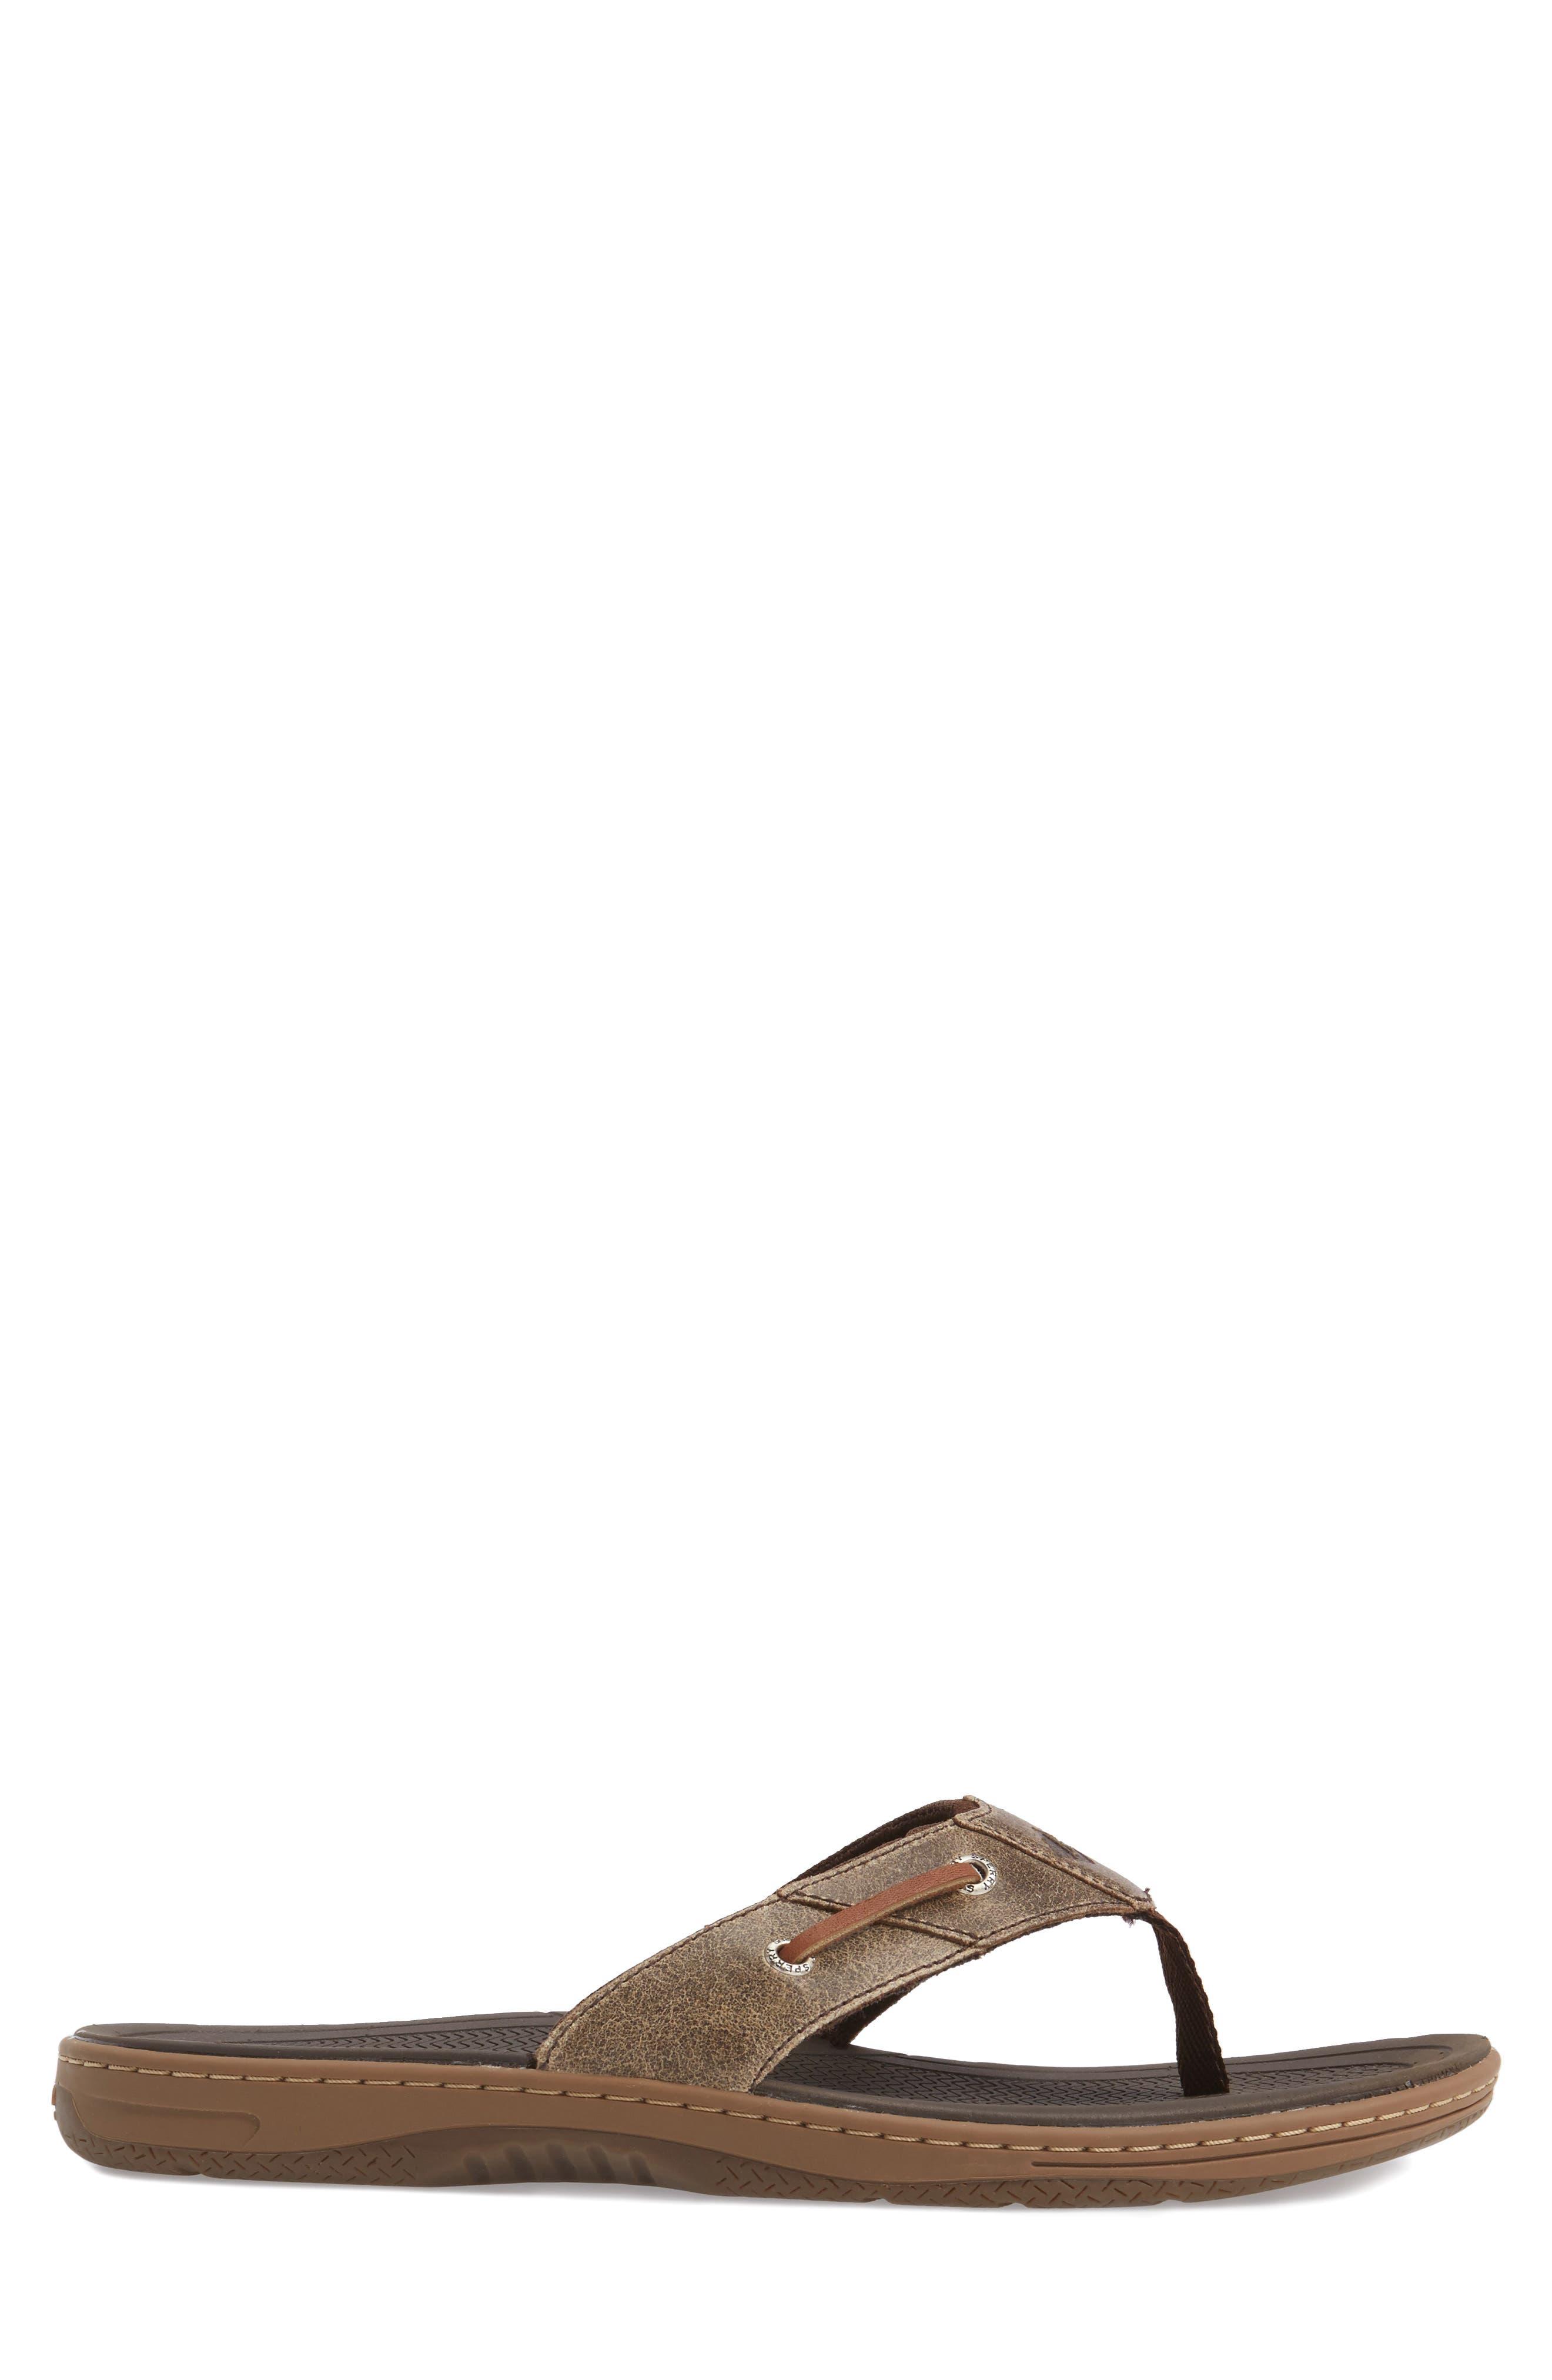 SPERRY, 'Baitfish' Sandal, Alternate thumbnail 3, color, BROWN/BROWN